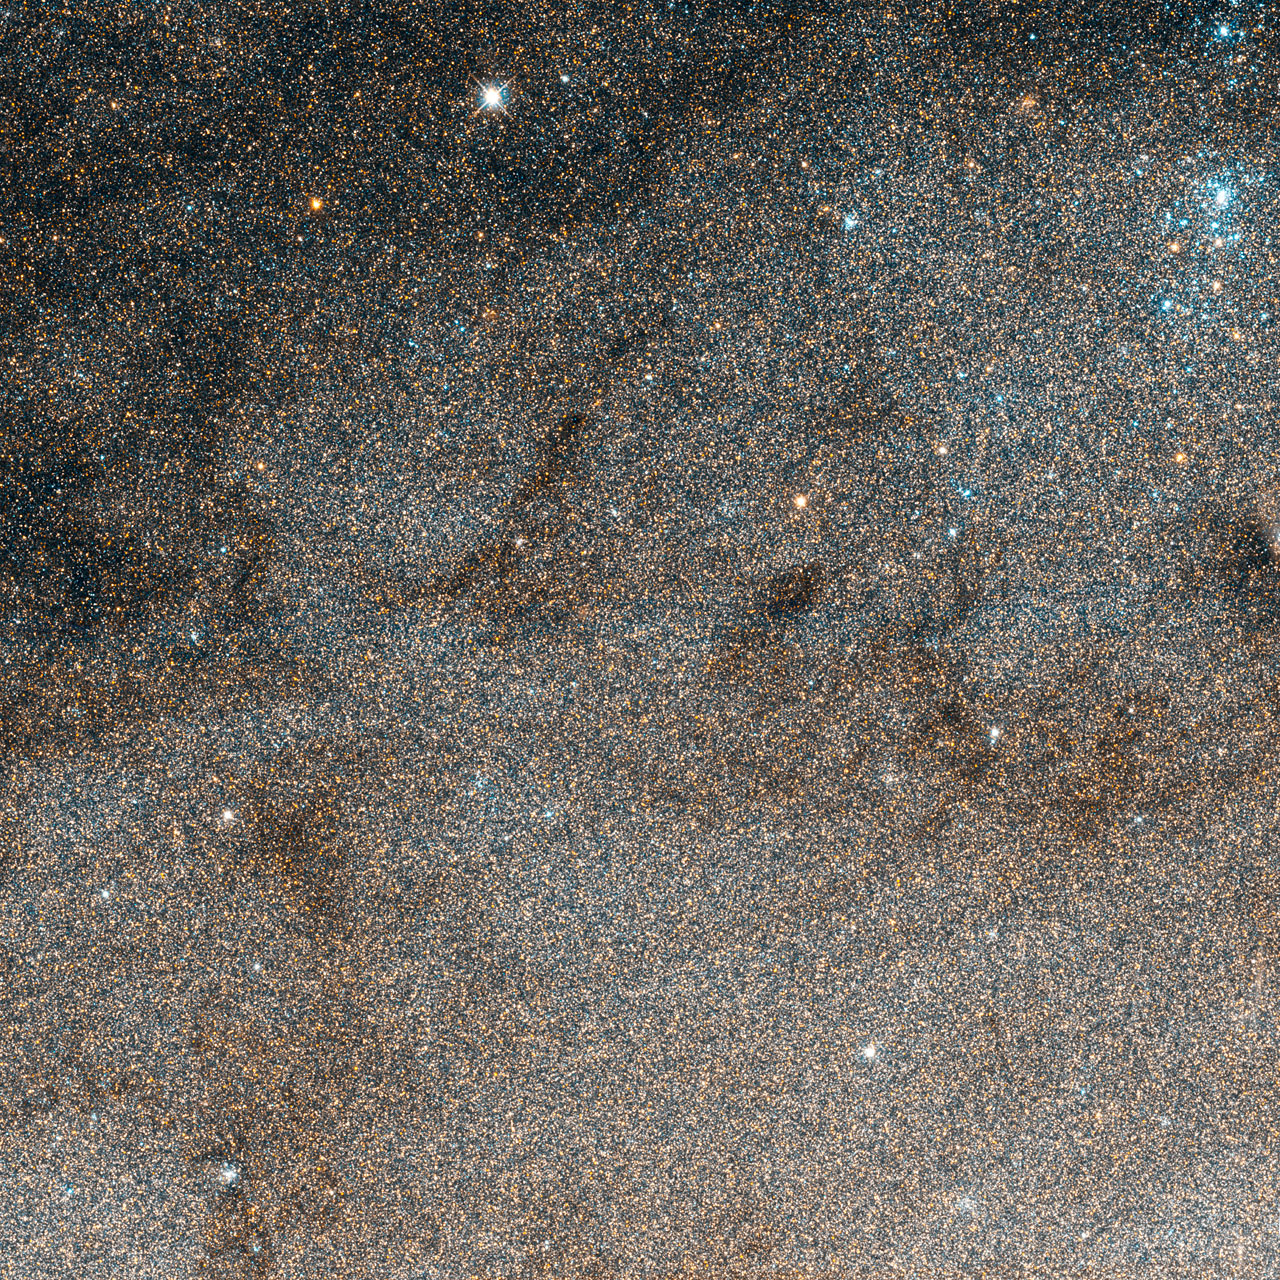 Hubble's Cepheid in the Andromeda Galaxy